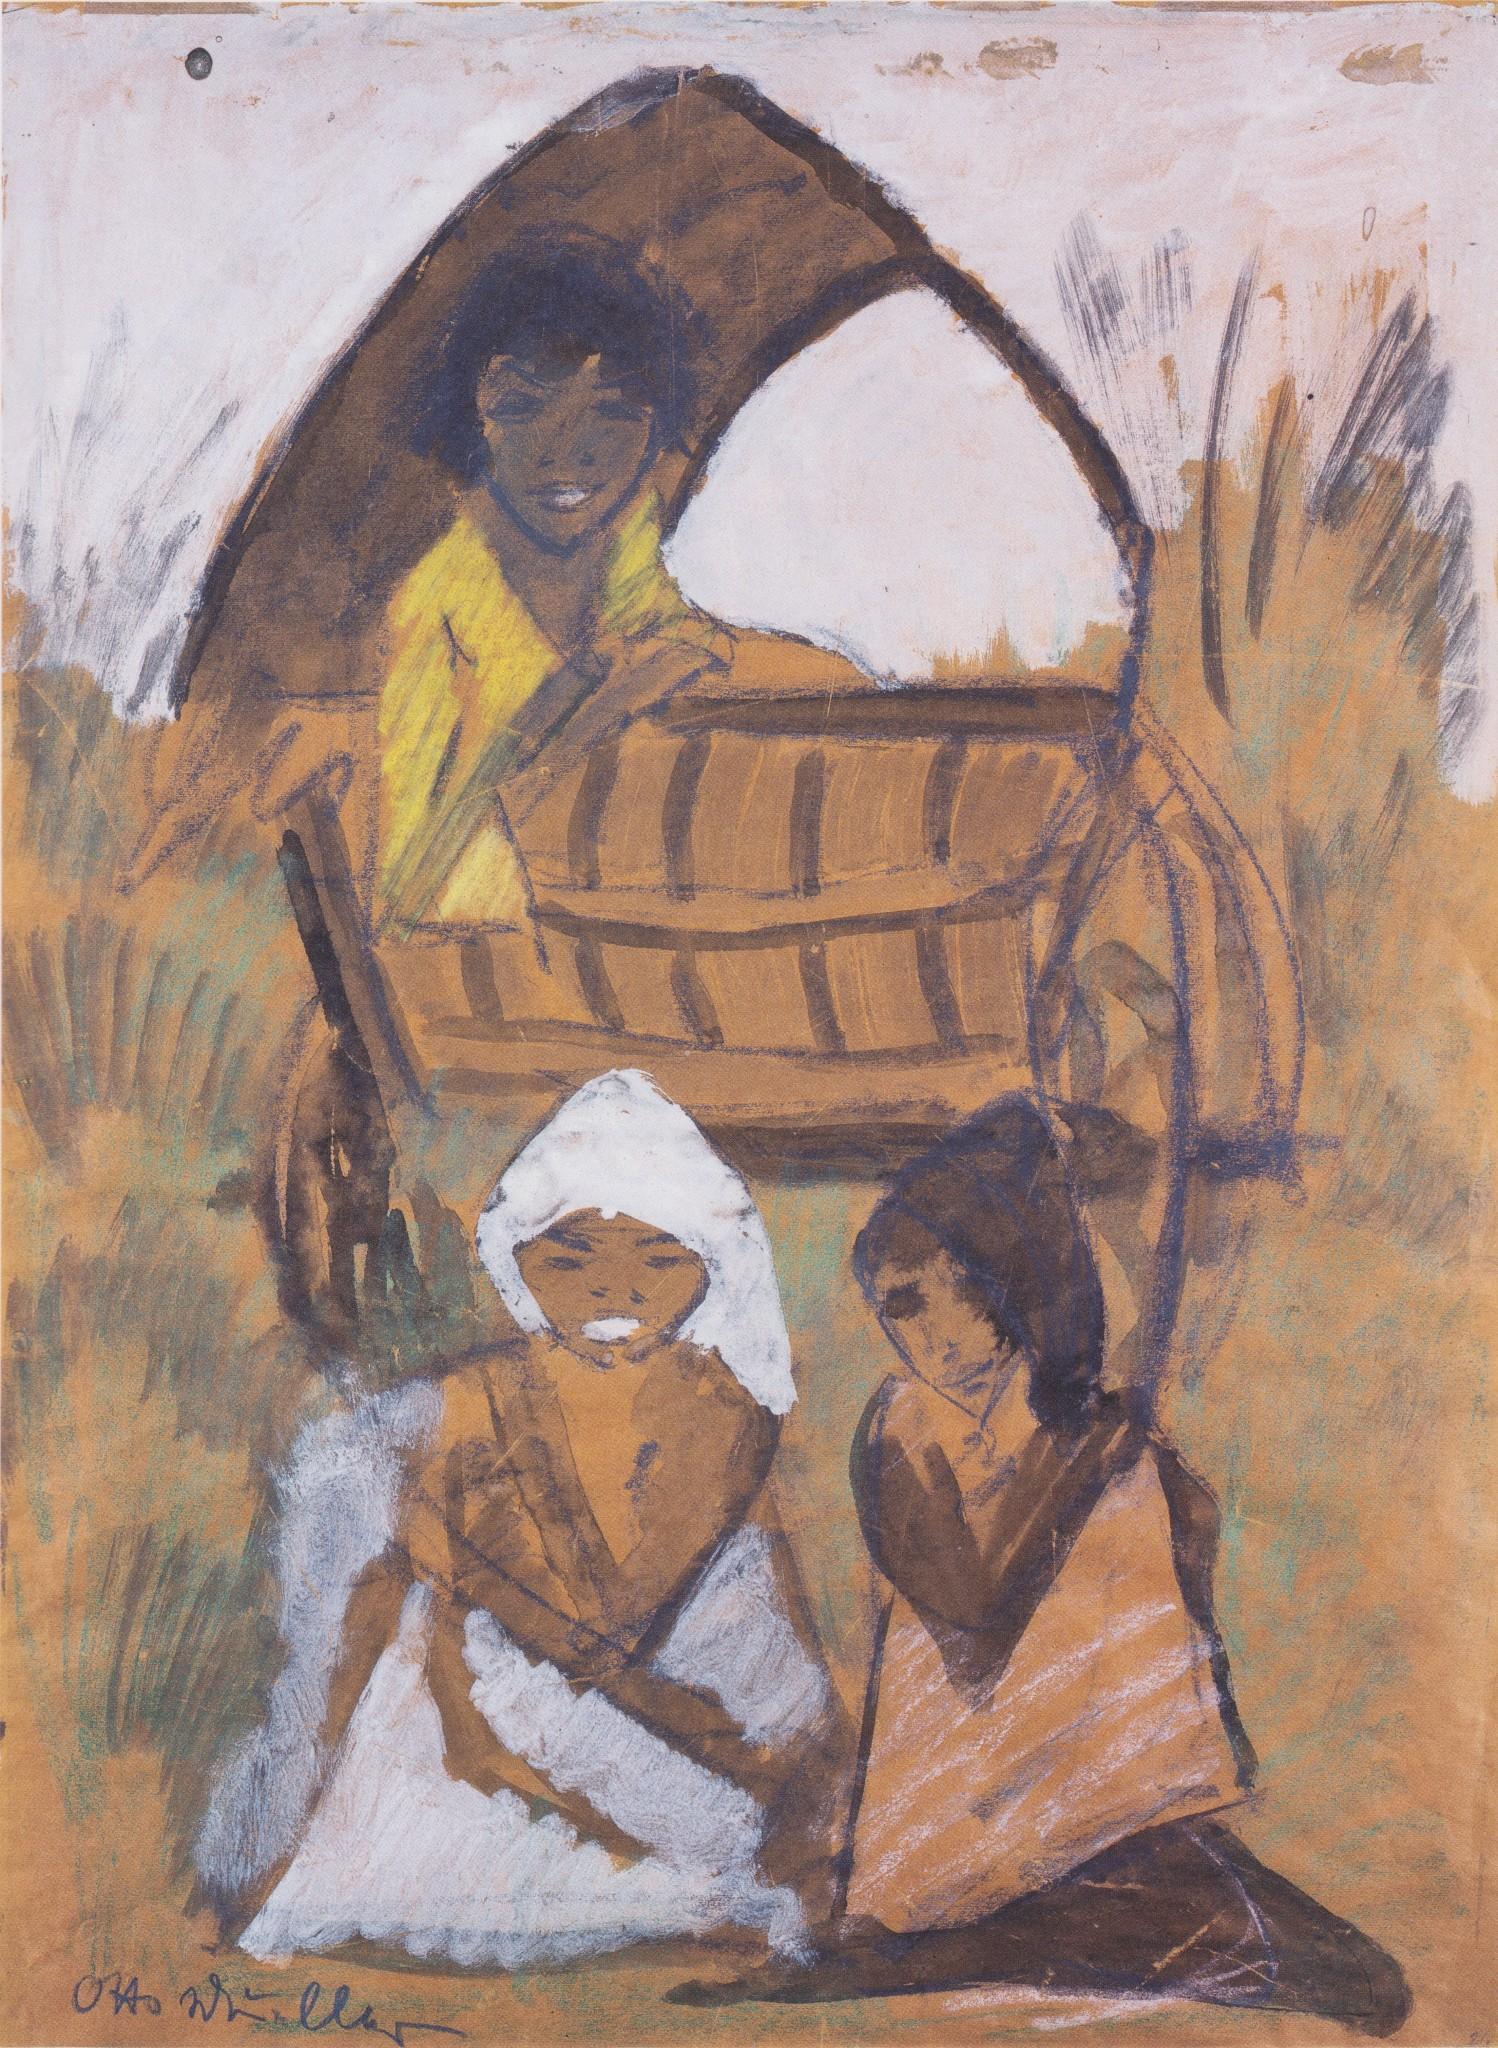 Живопись_Отто-Мюллер_Цыганскии-табор-1927.jpeg